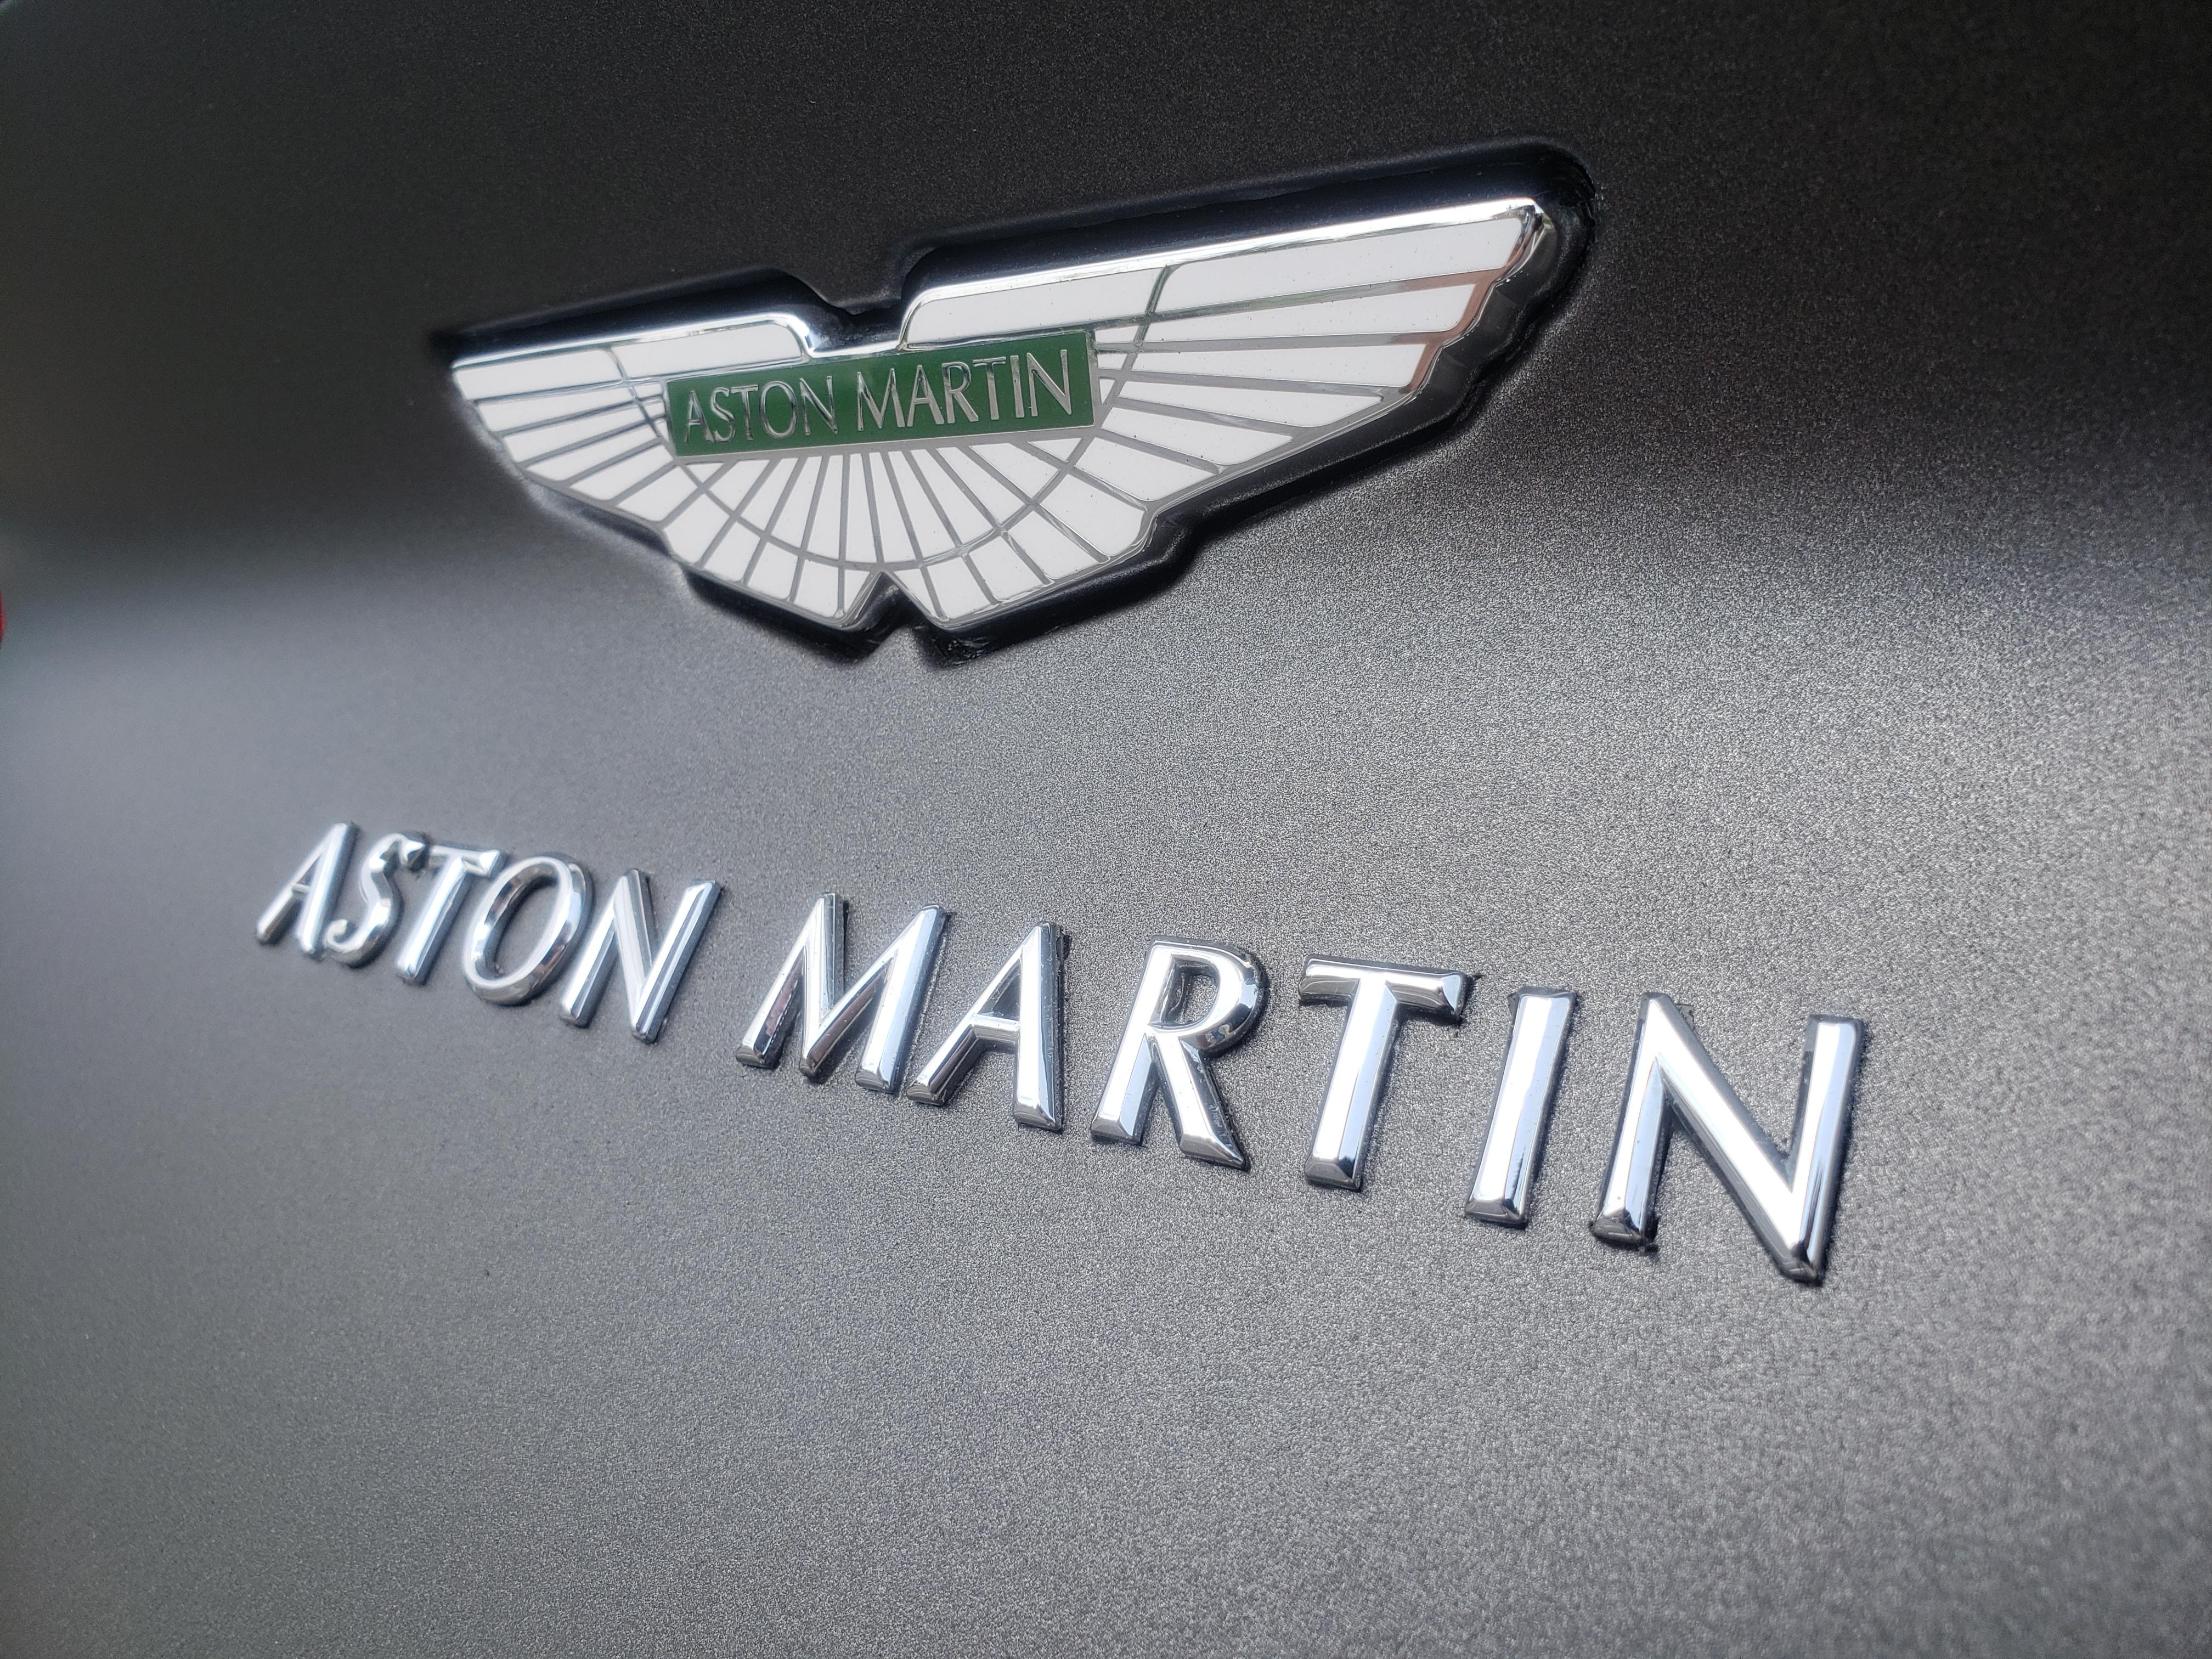 Aston-Martin_Vehicle-Wrap_Blackout-Package_LSIGraphics_Memphis-TN_4 ..